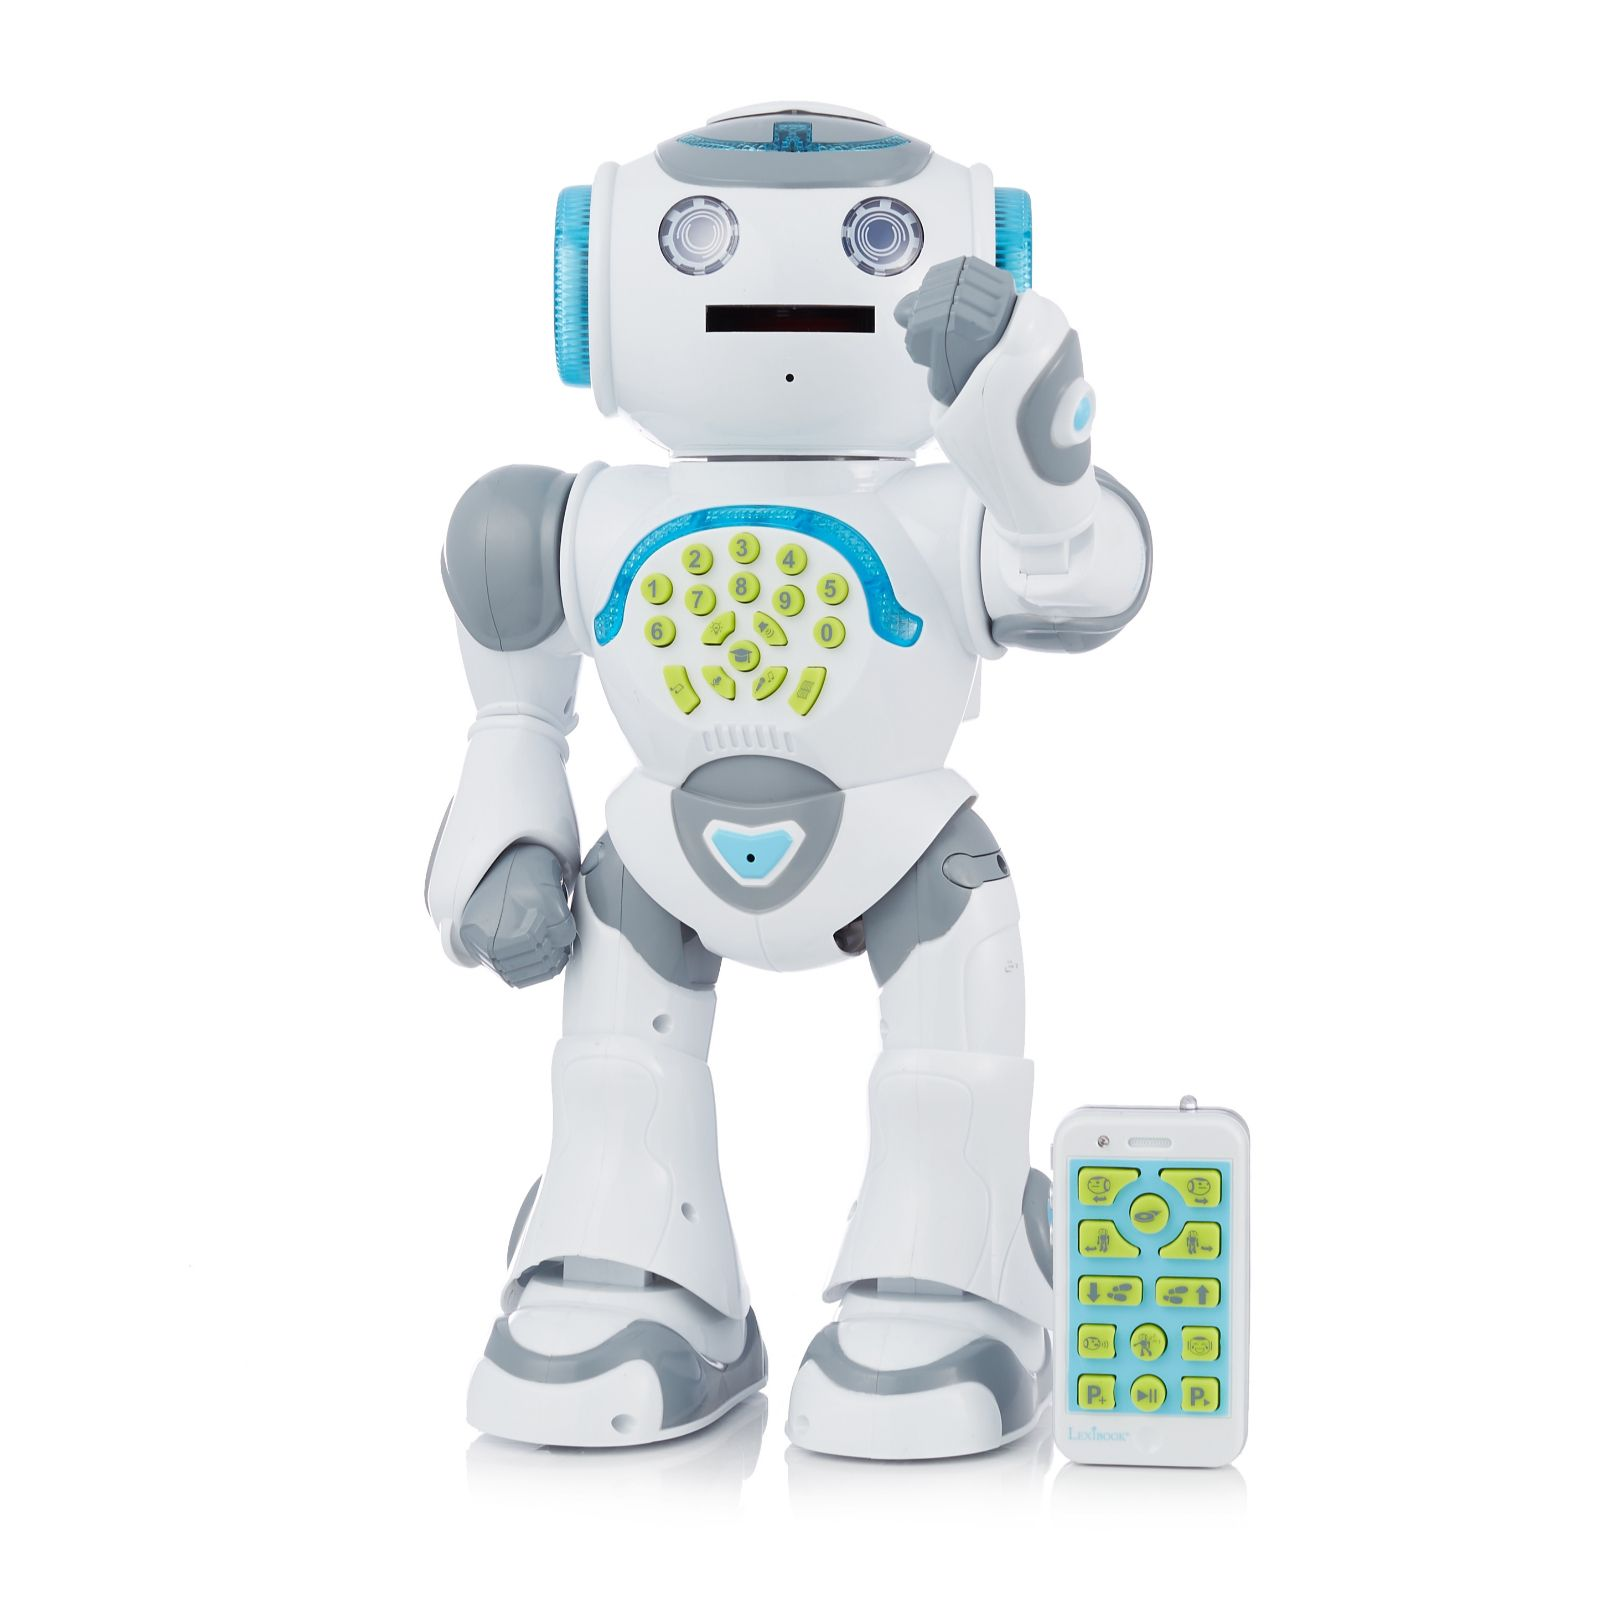 Powerman Max Interactive Robot - QVC UK